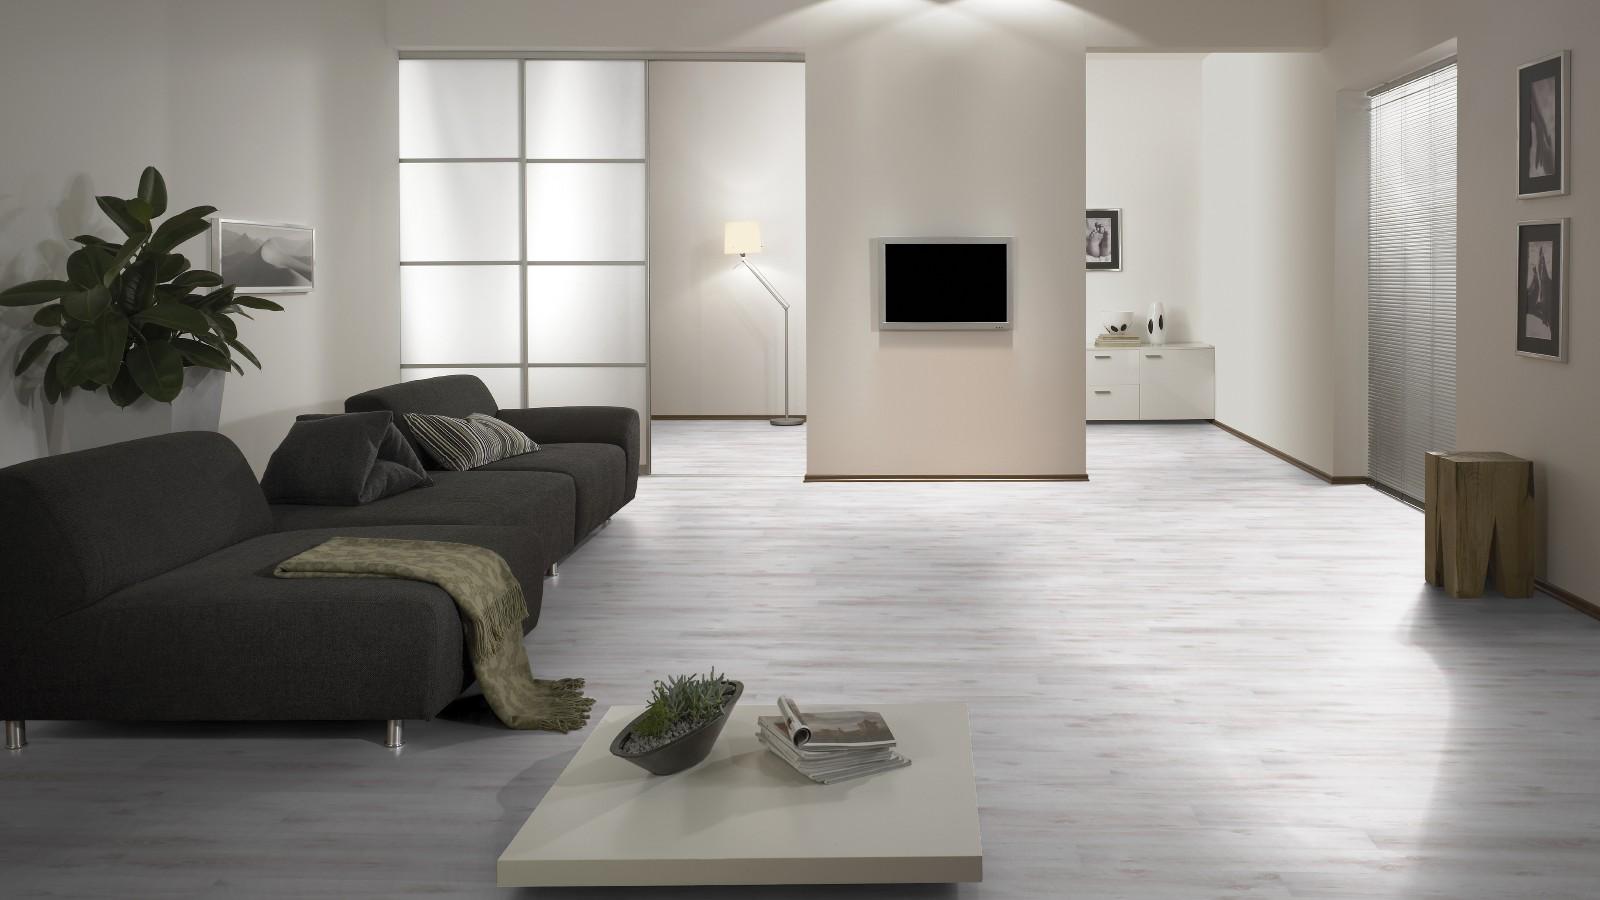 Bevorzugt Kronotex 7mm Standard Laminat | Eiche Weiß D2951 | Holzoptik OM42